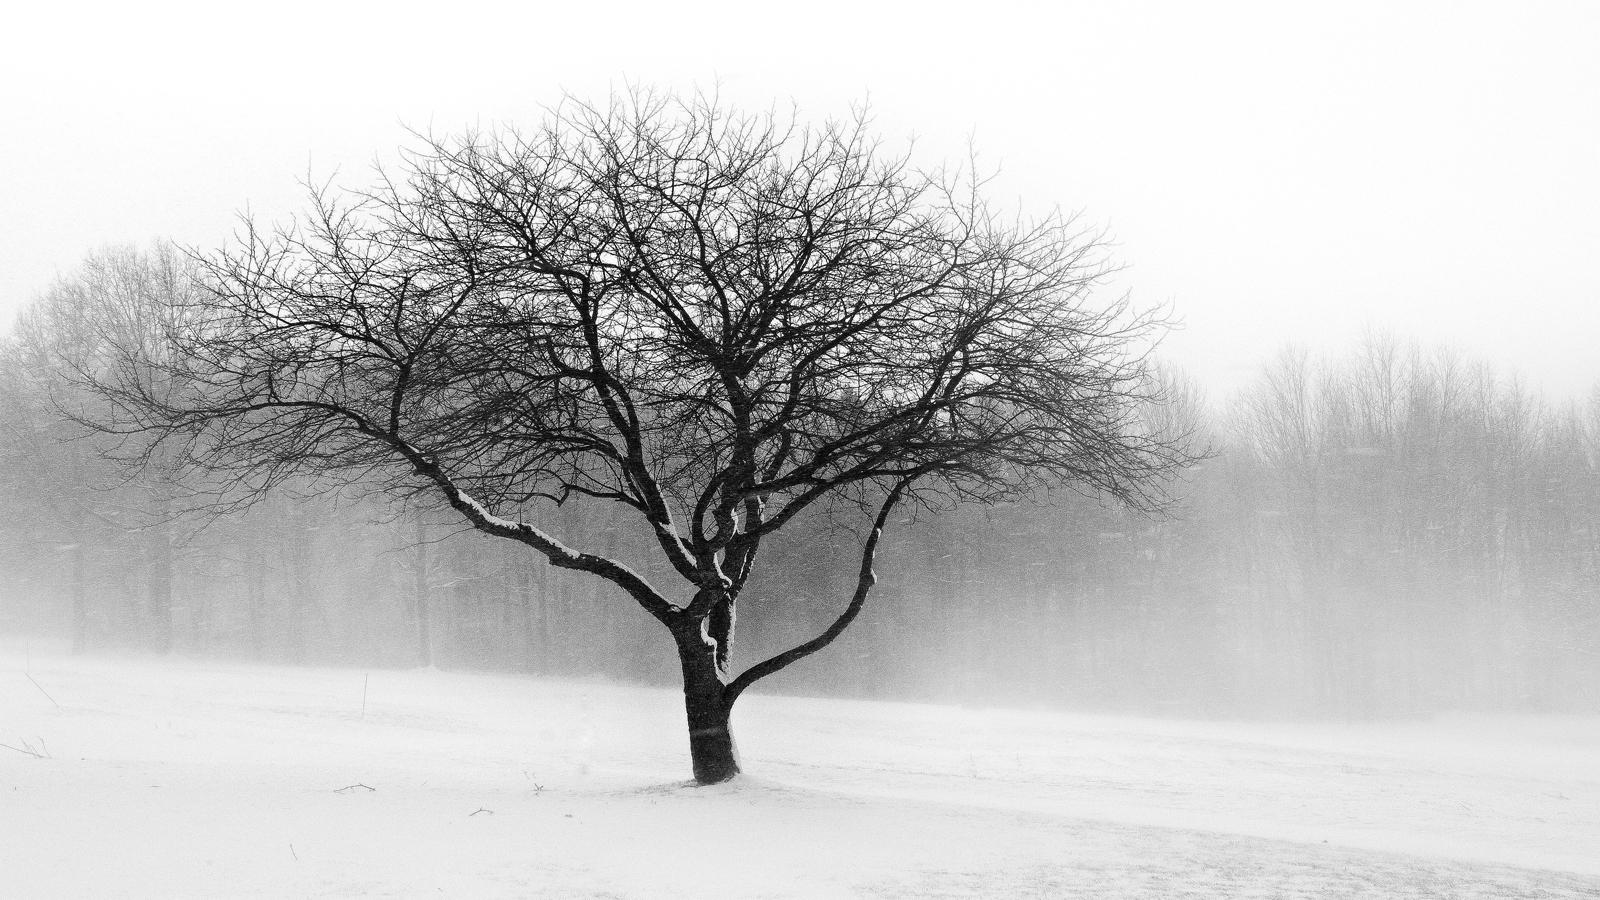 blizzard by BillyRWebb